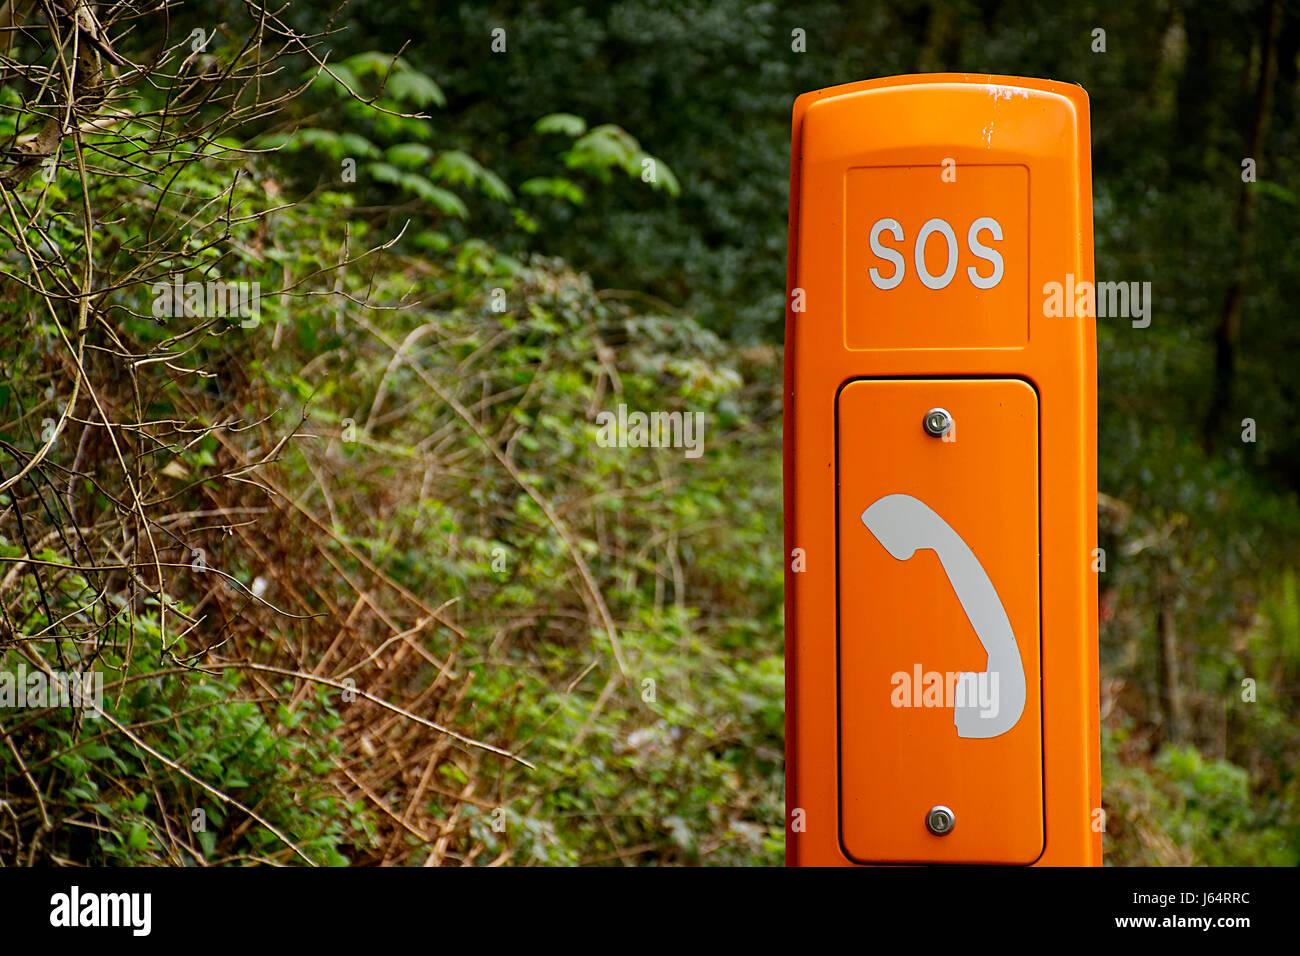 Emergency phone in rural location.North Wales,United Kingdom.Roadside assistance phone.Orange emergency phone box - Stock Image